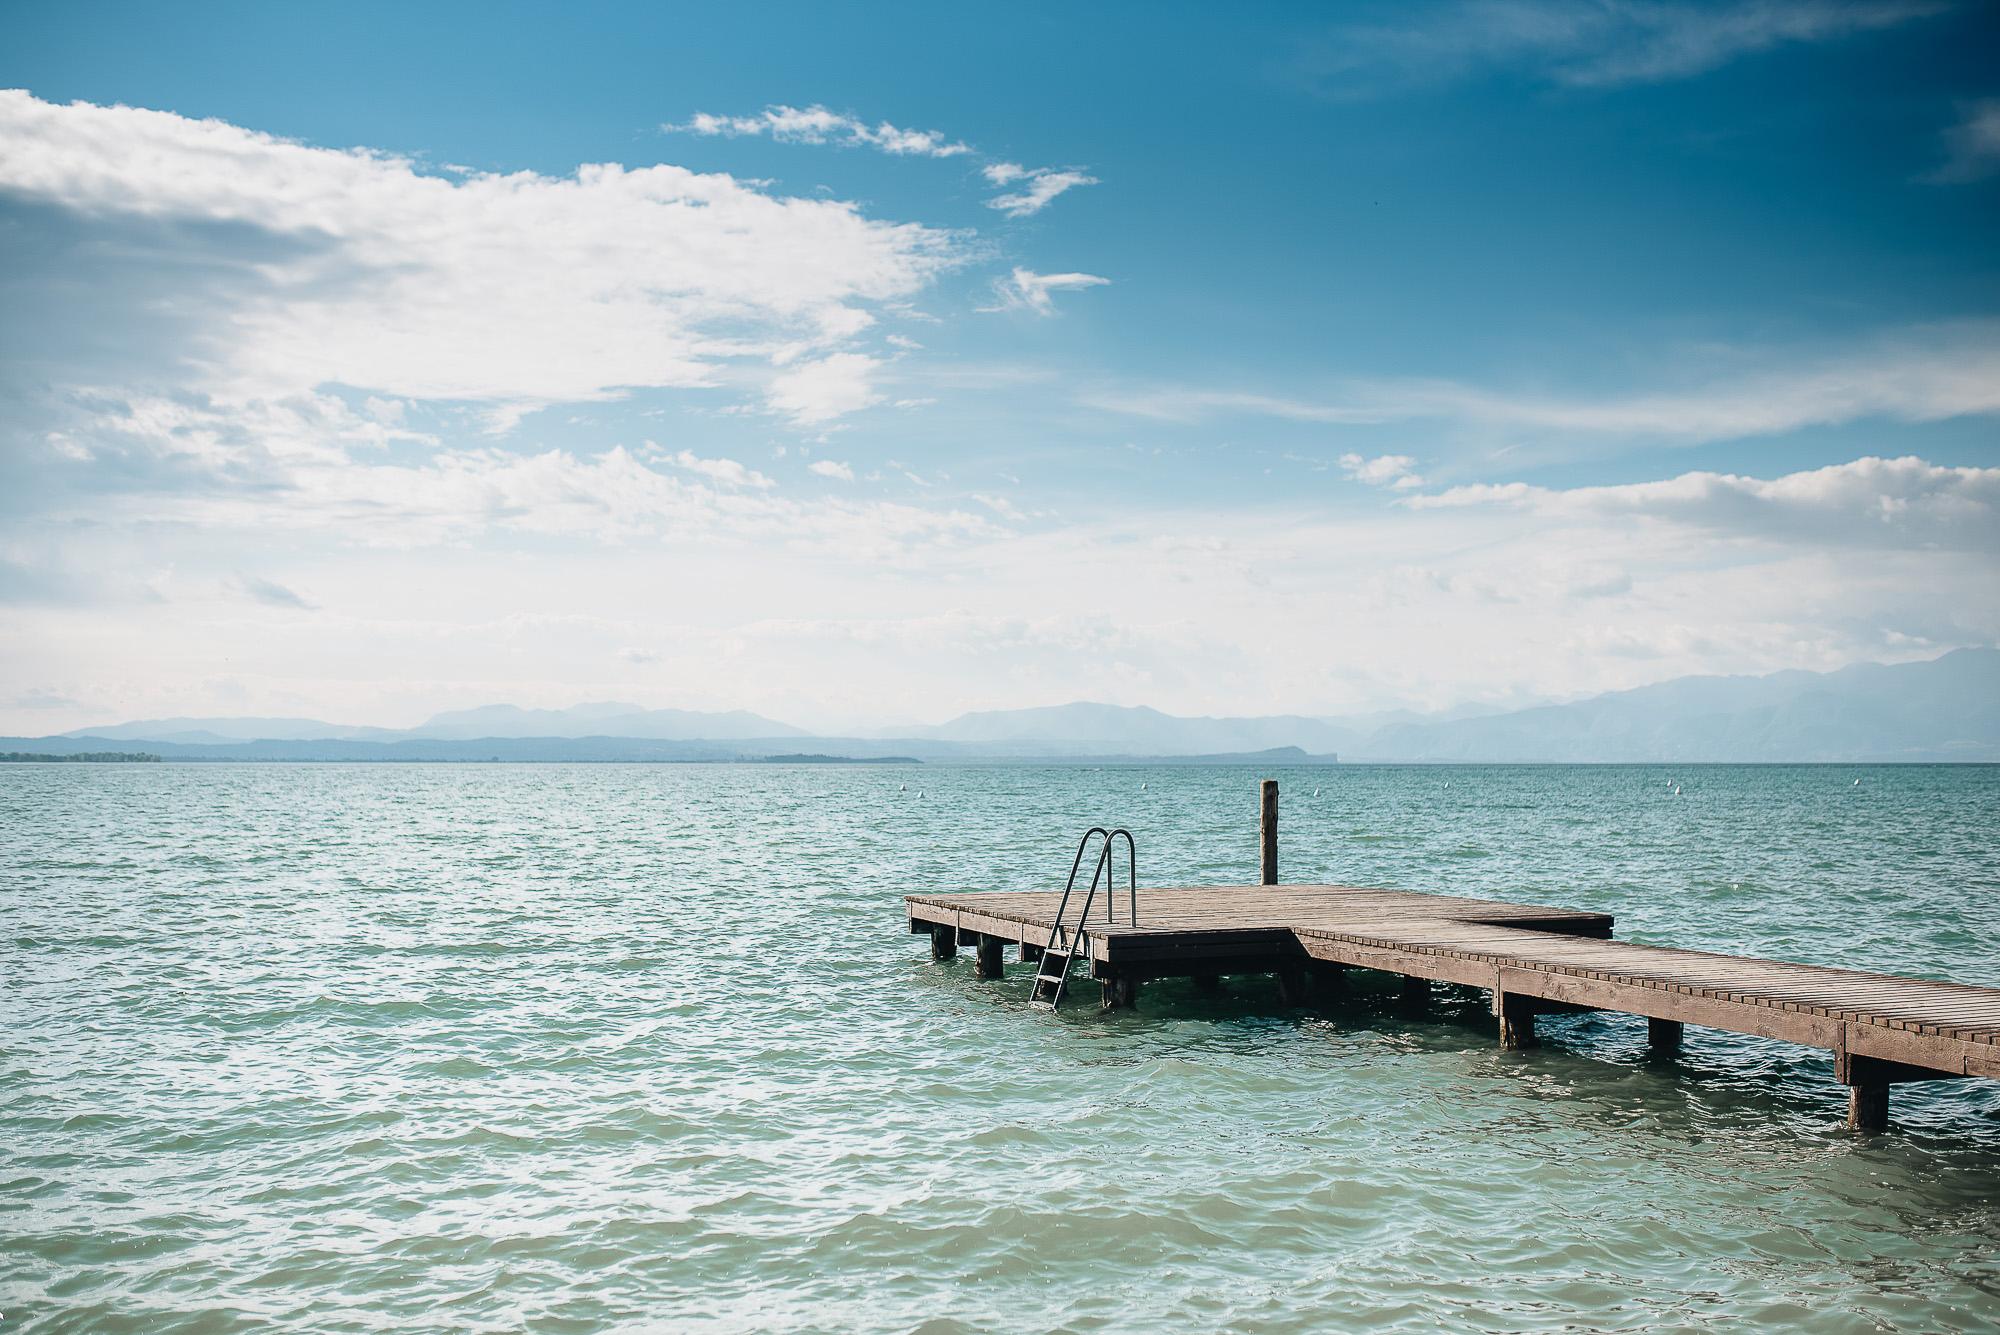 OurBeautifulAdventure-LakeGarda-Italy-Blog-1588.jpg